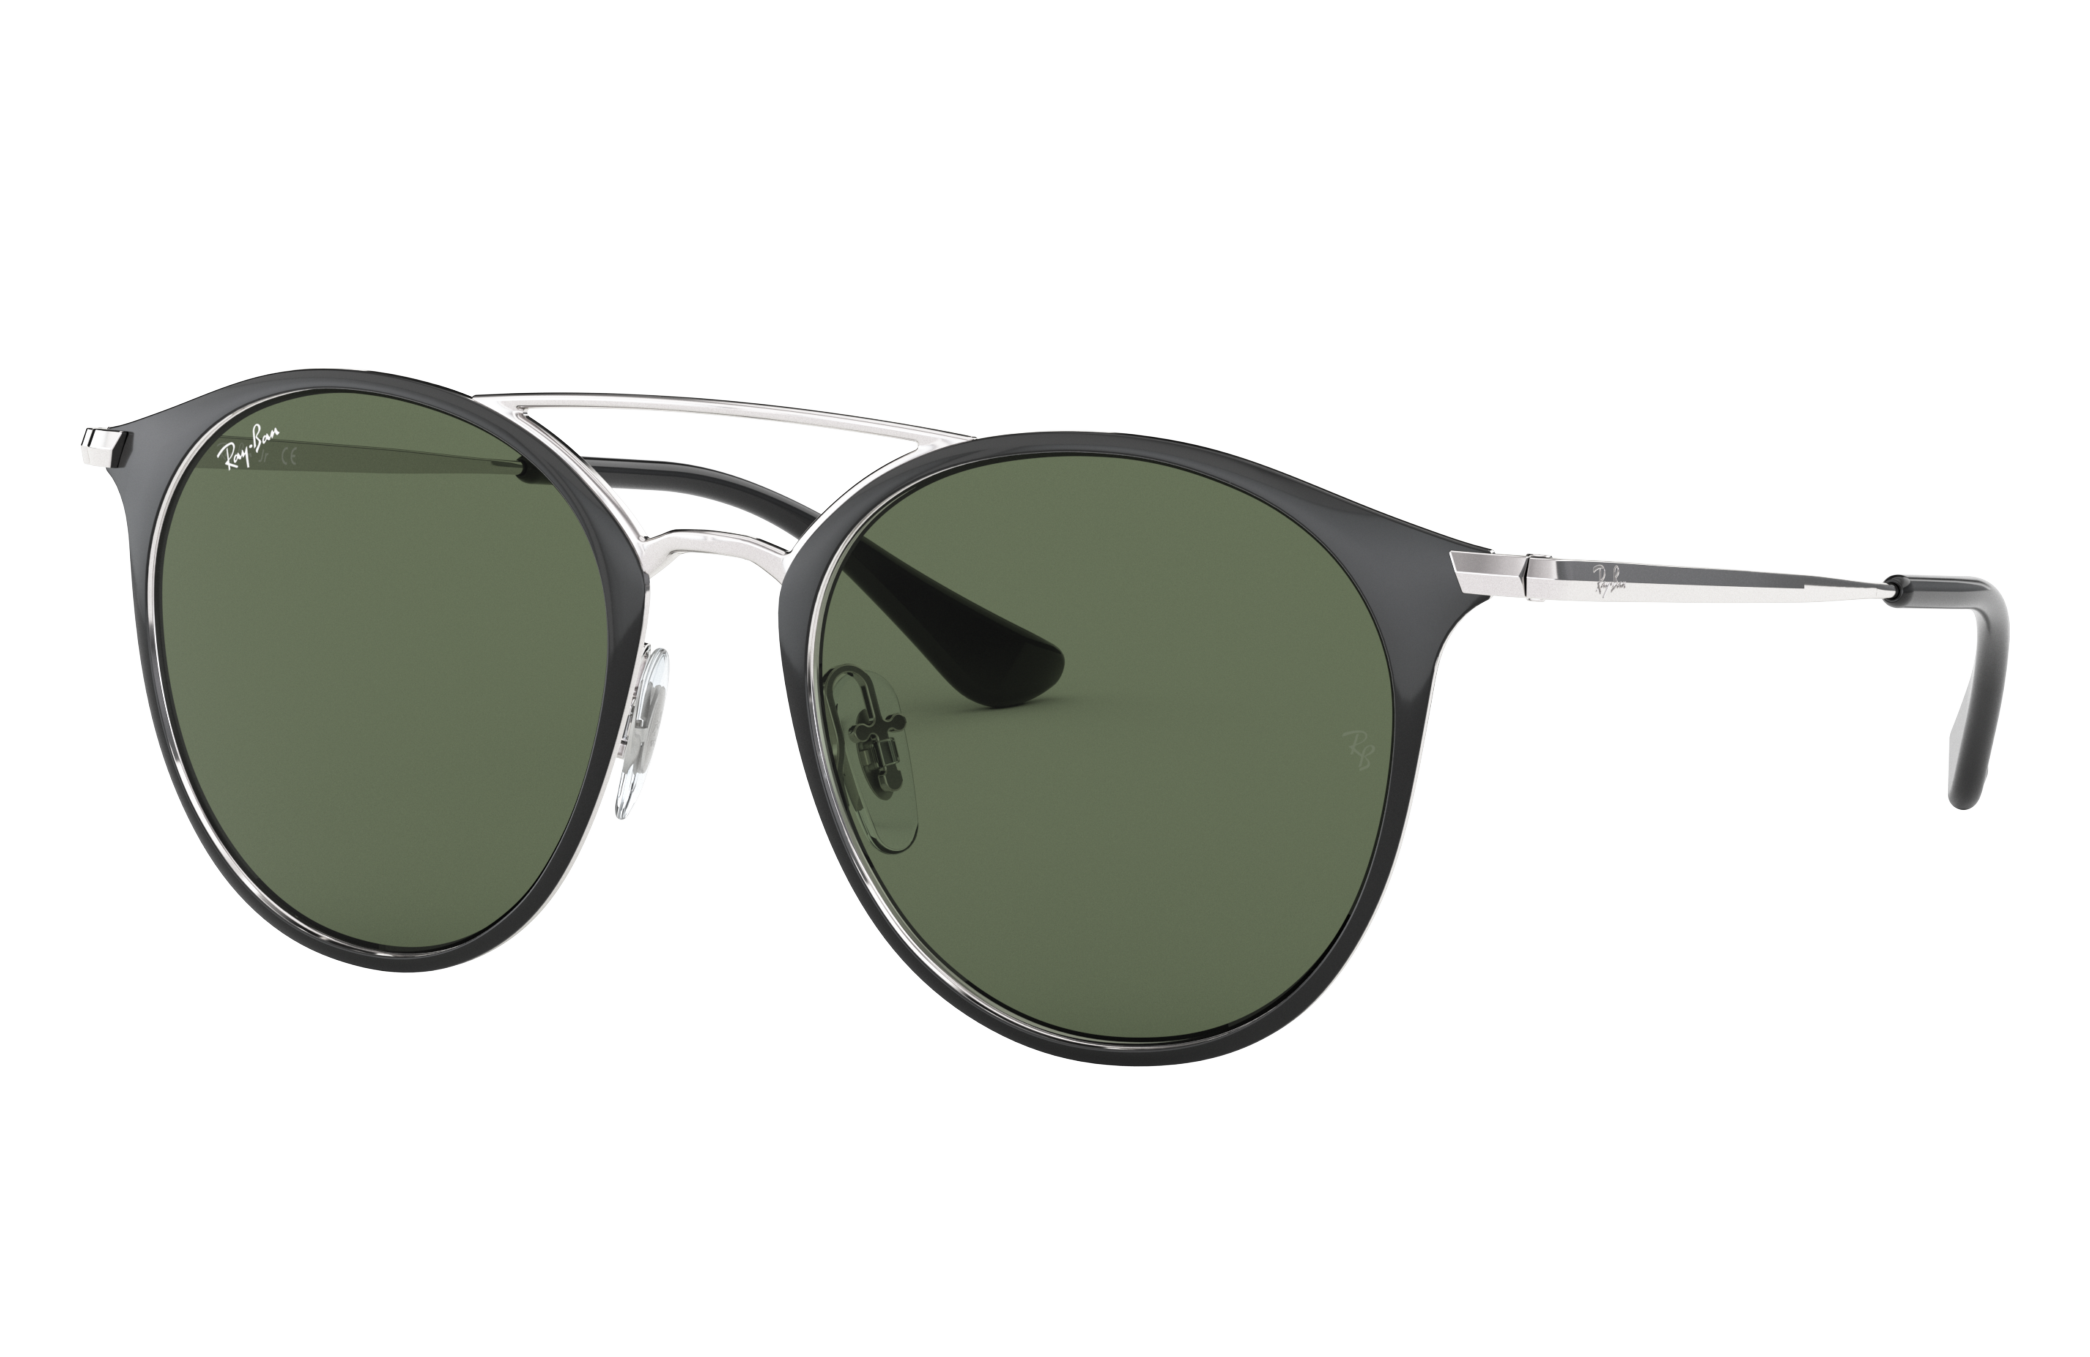 Ray-Ban Rj9545s Silver, Green Lenses - RJ9545S